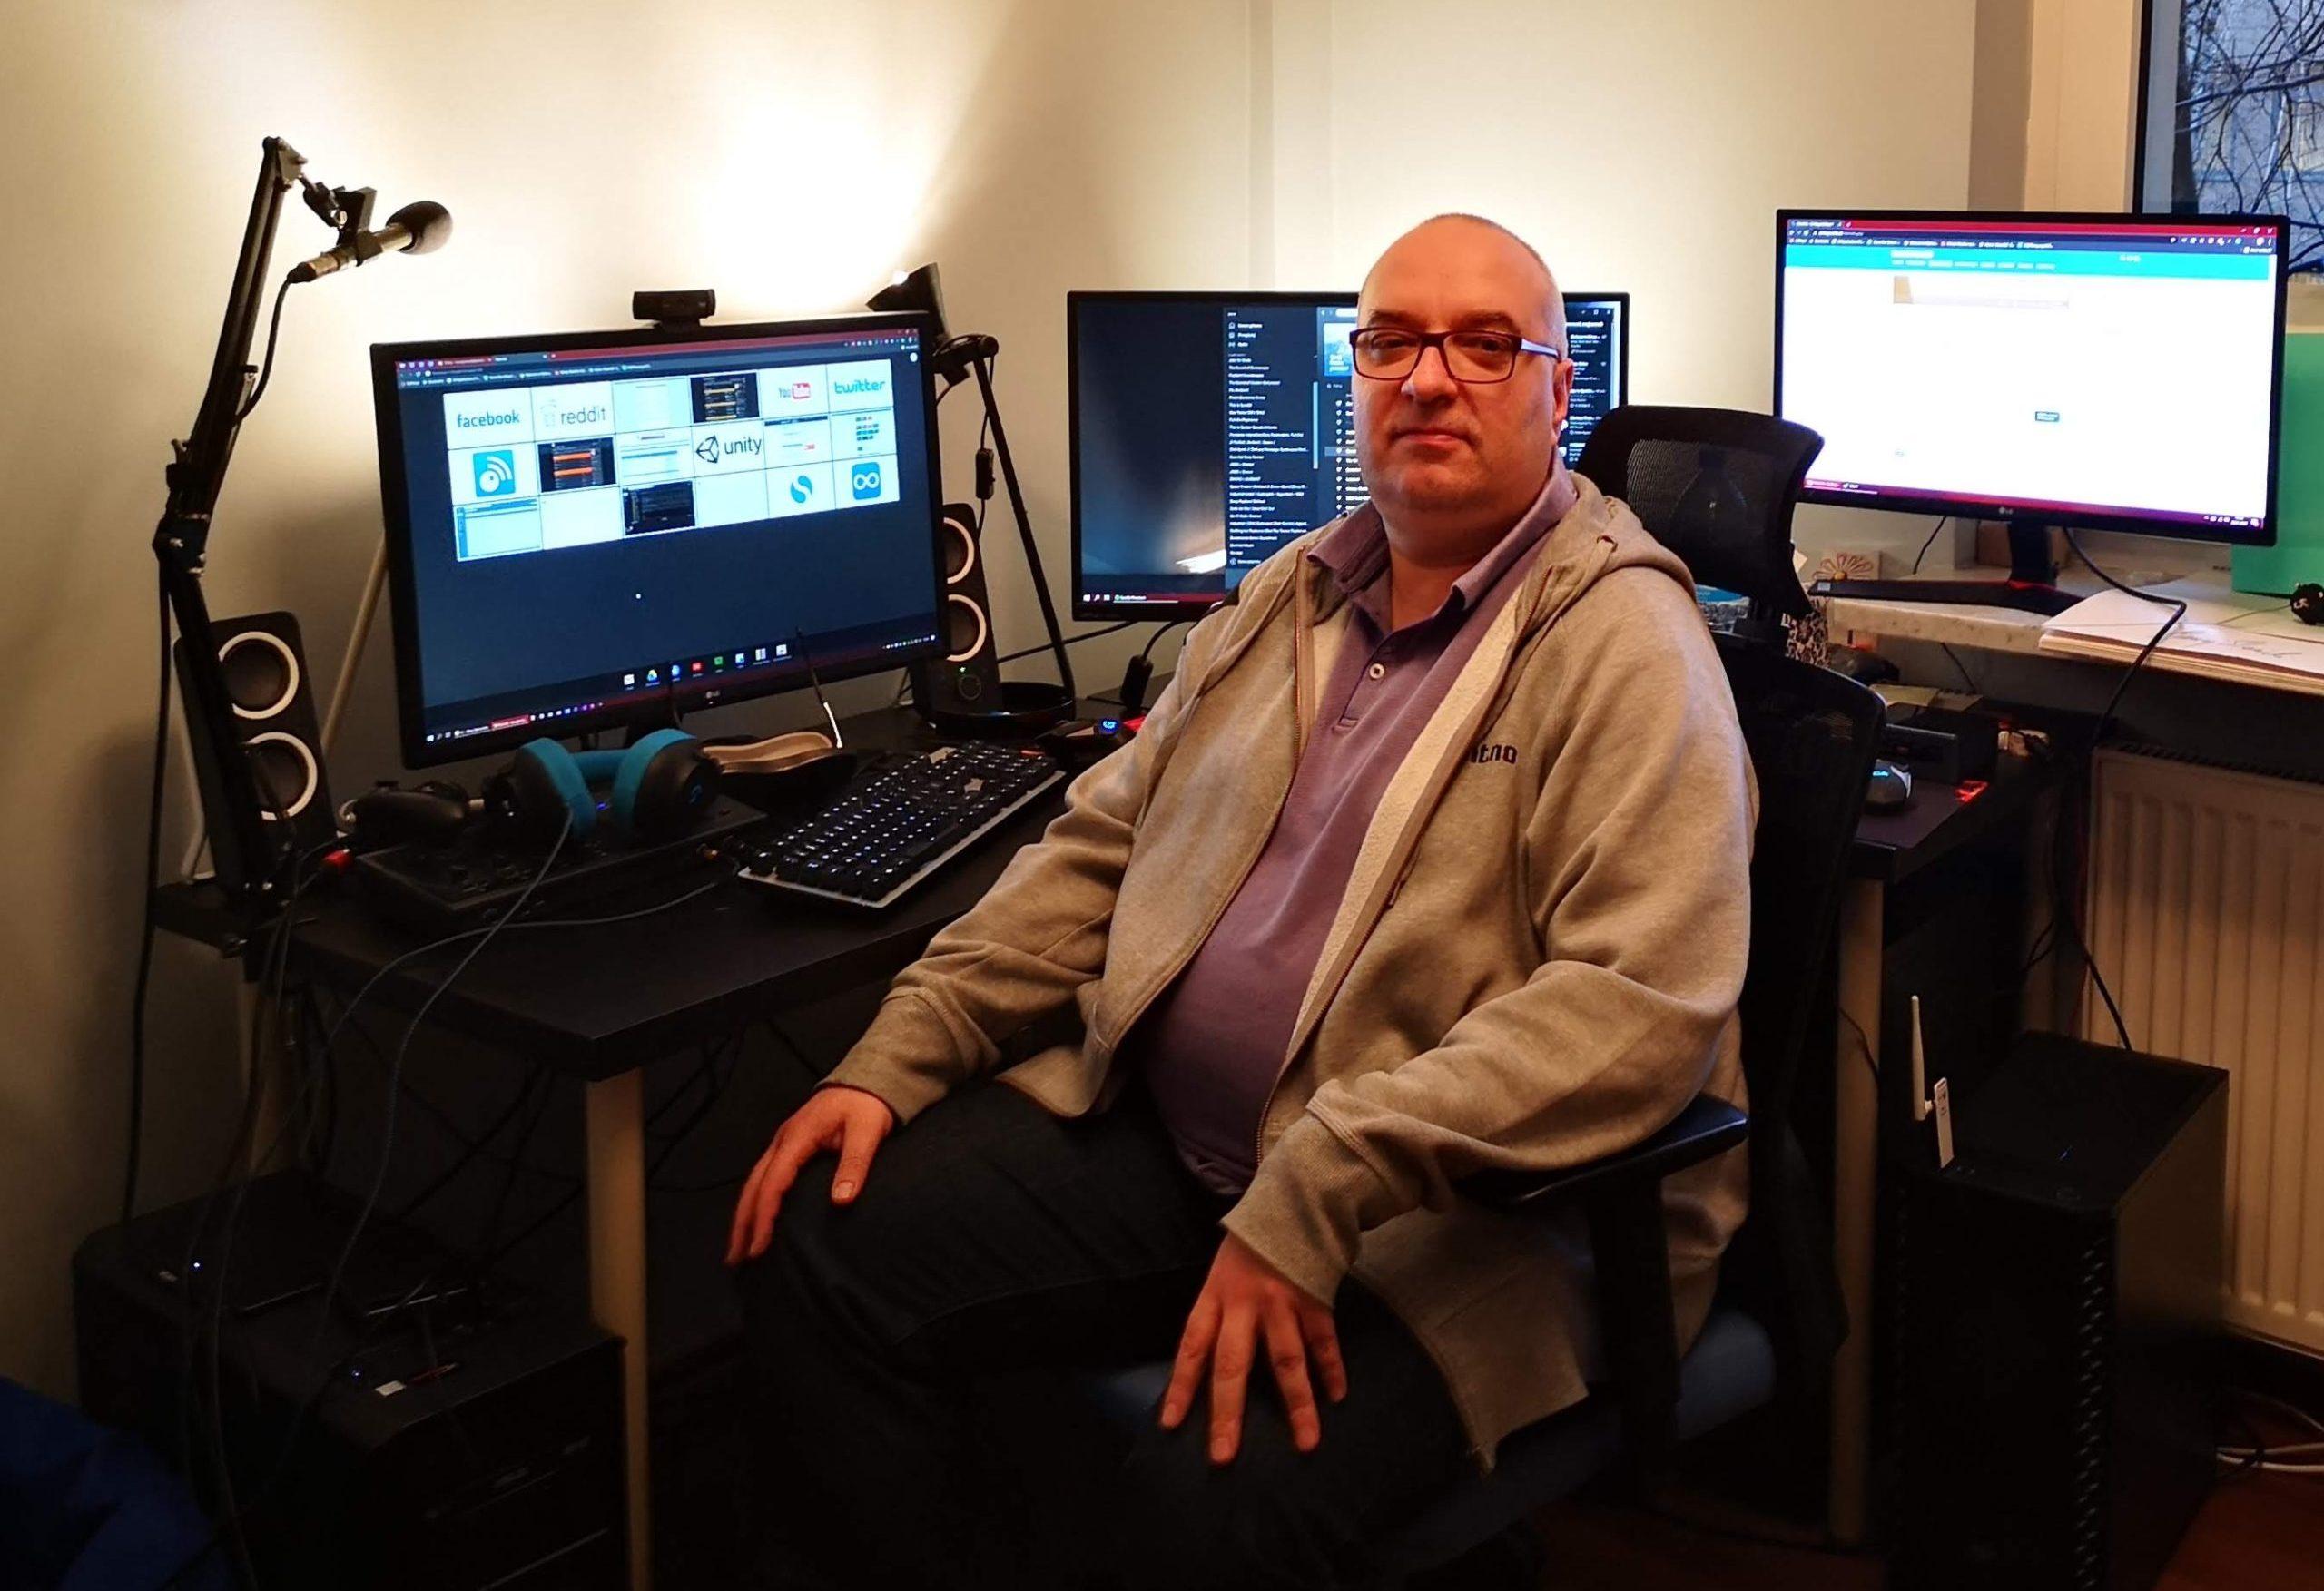 Maciej Miąsik, член правления игрового издательства Movie Games